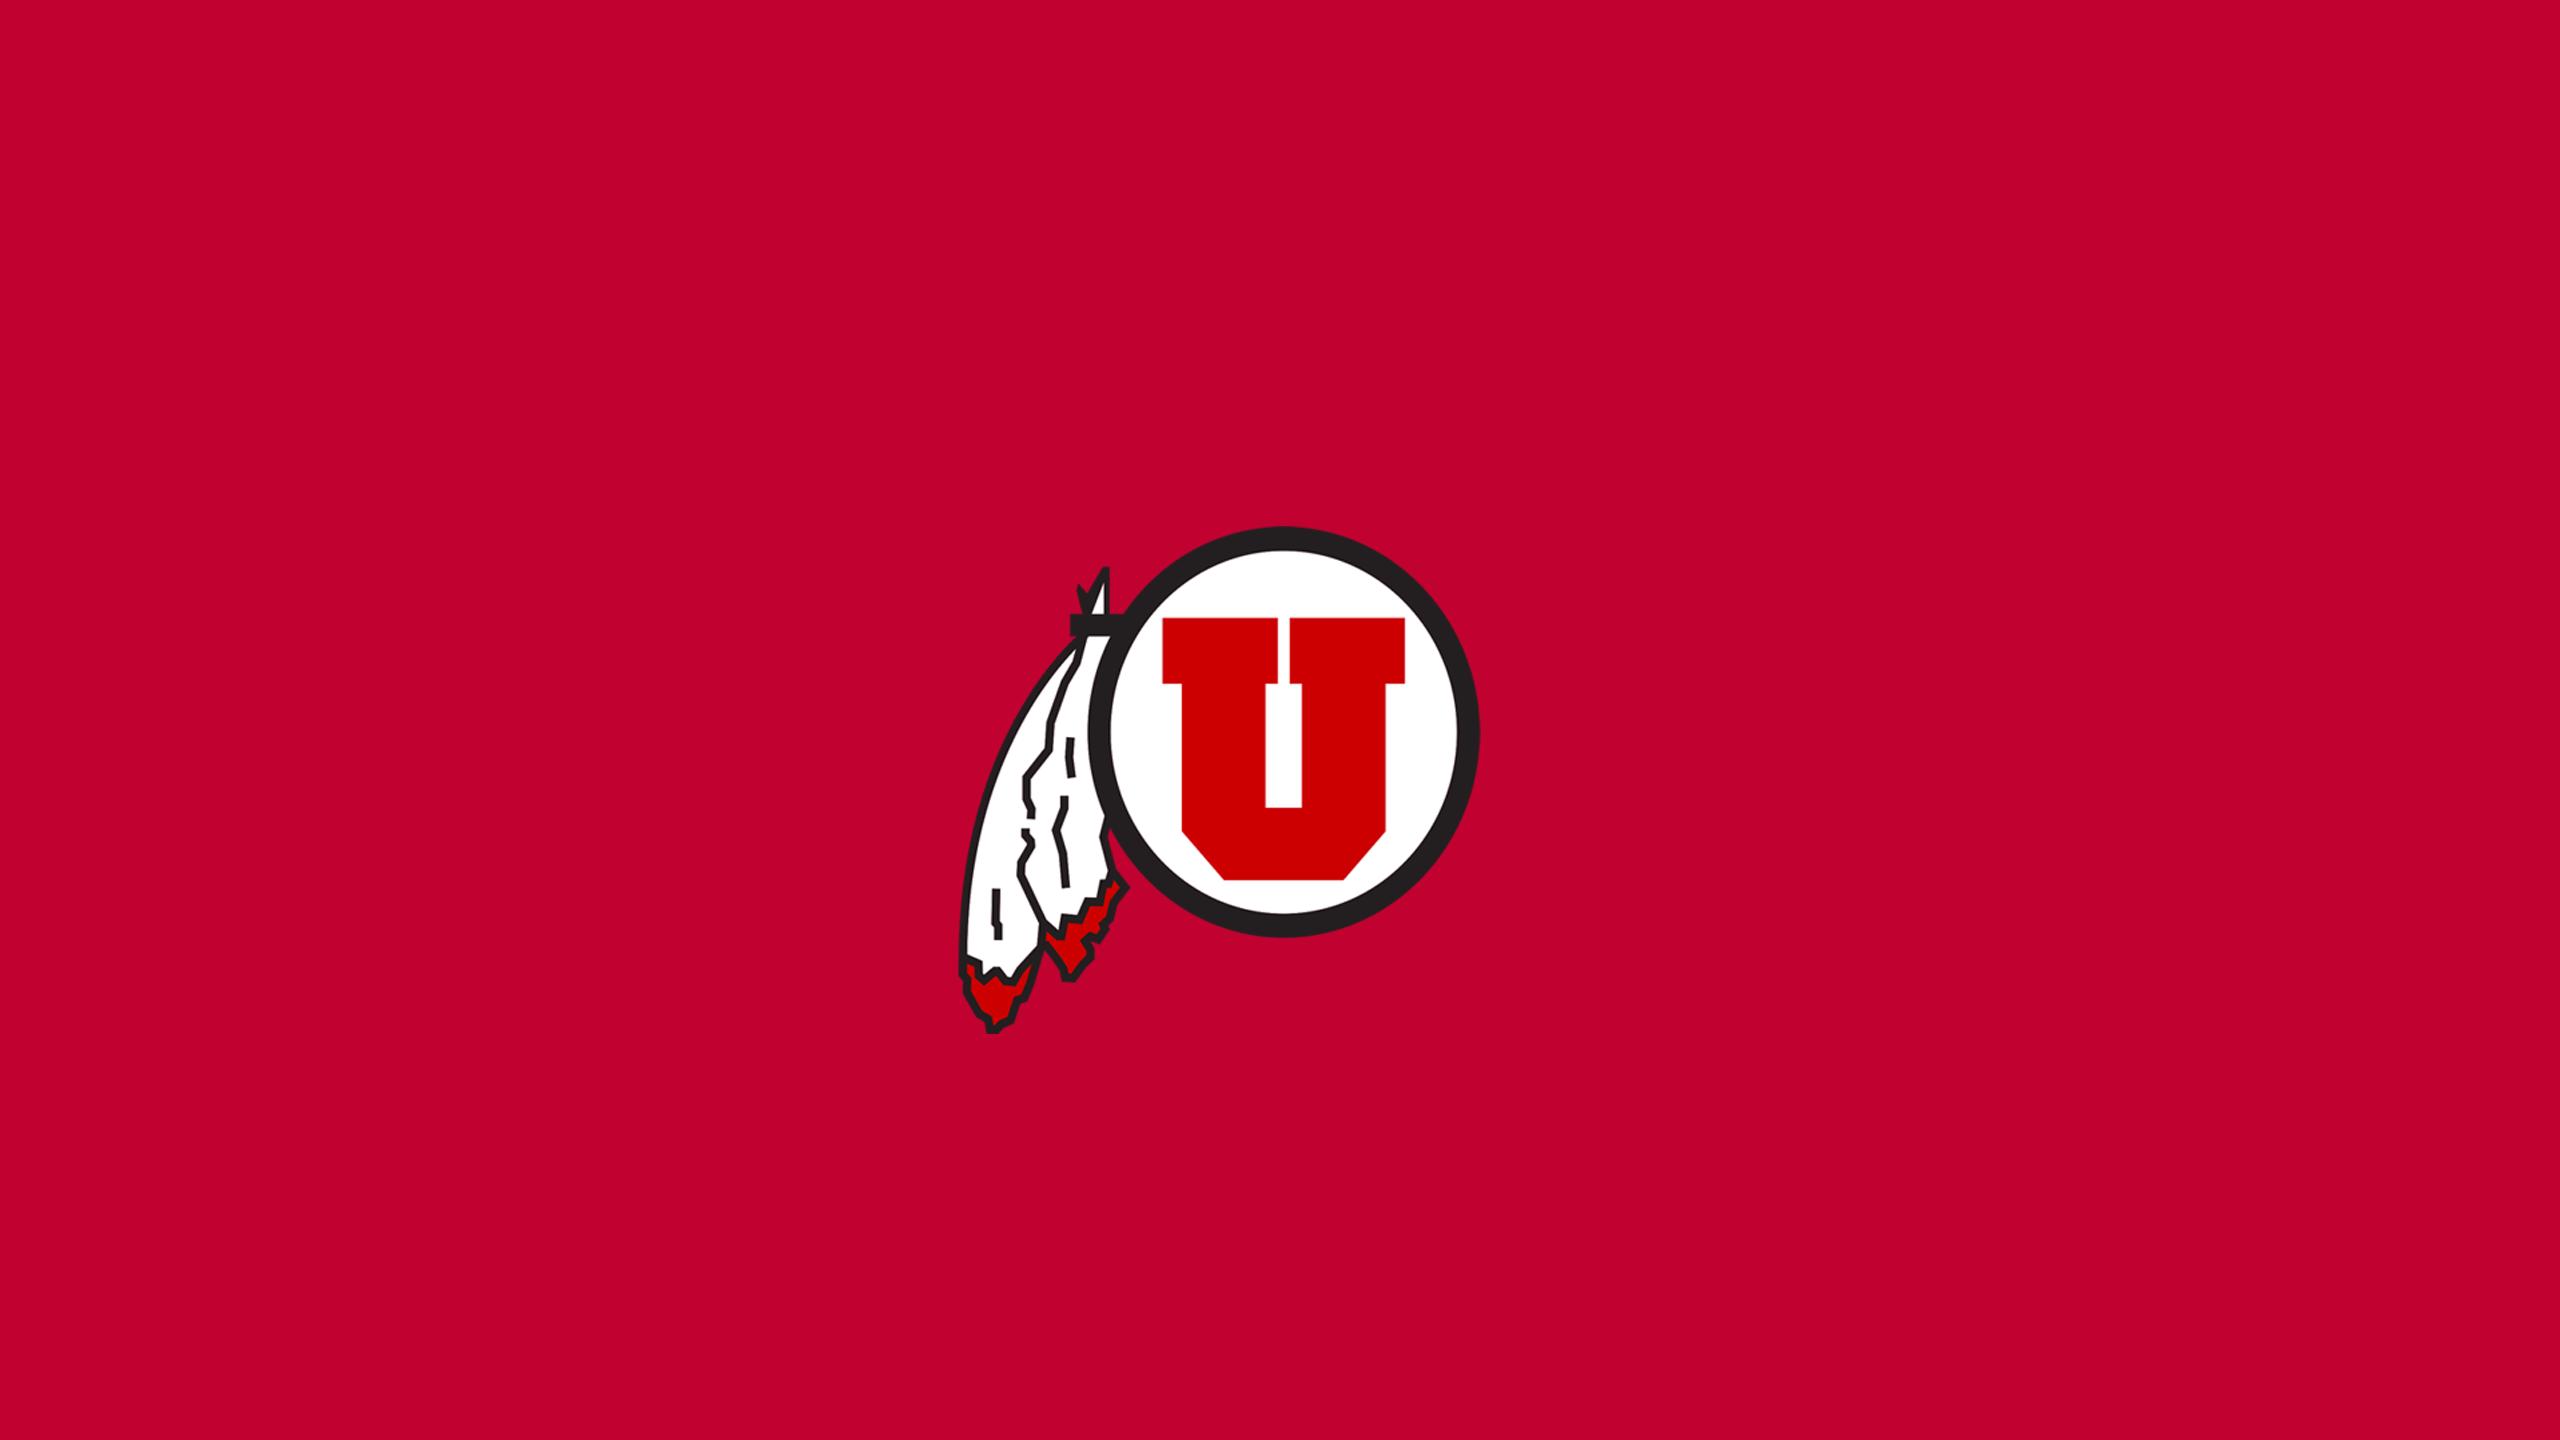 University of Utah Utes